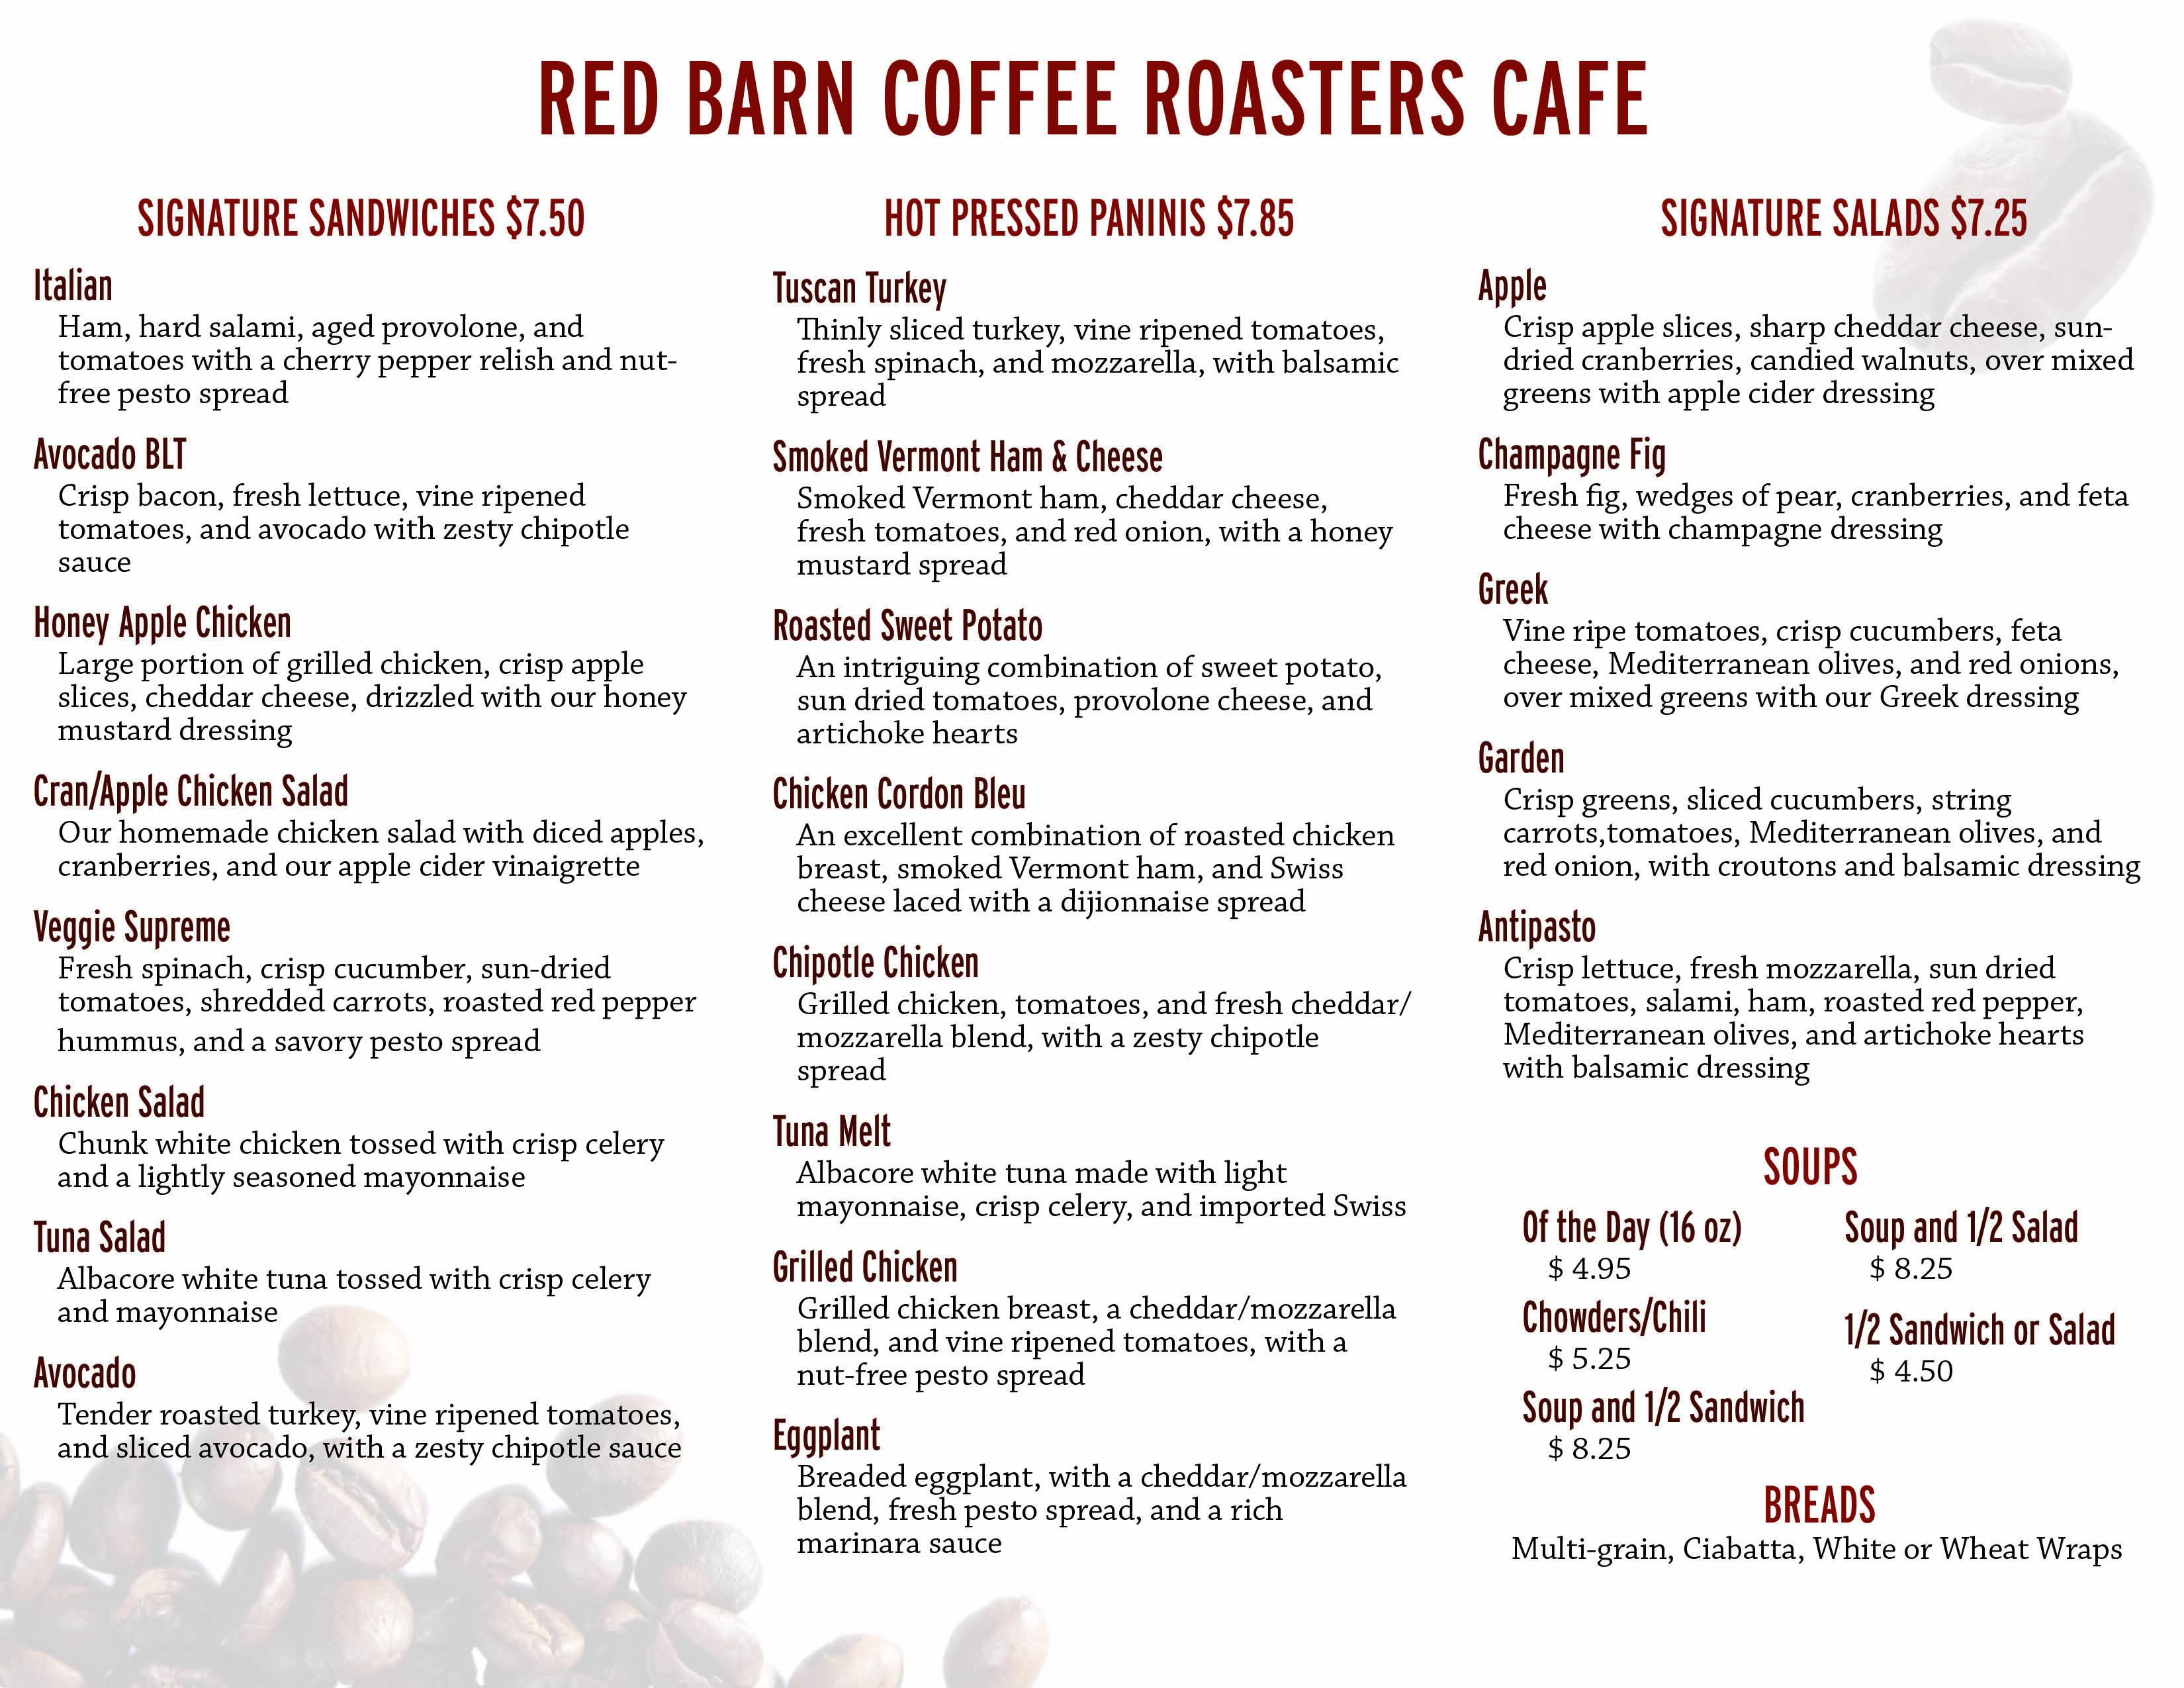 Red Barn Coffee Roasters Cafe Menu Allison Hammond